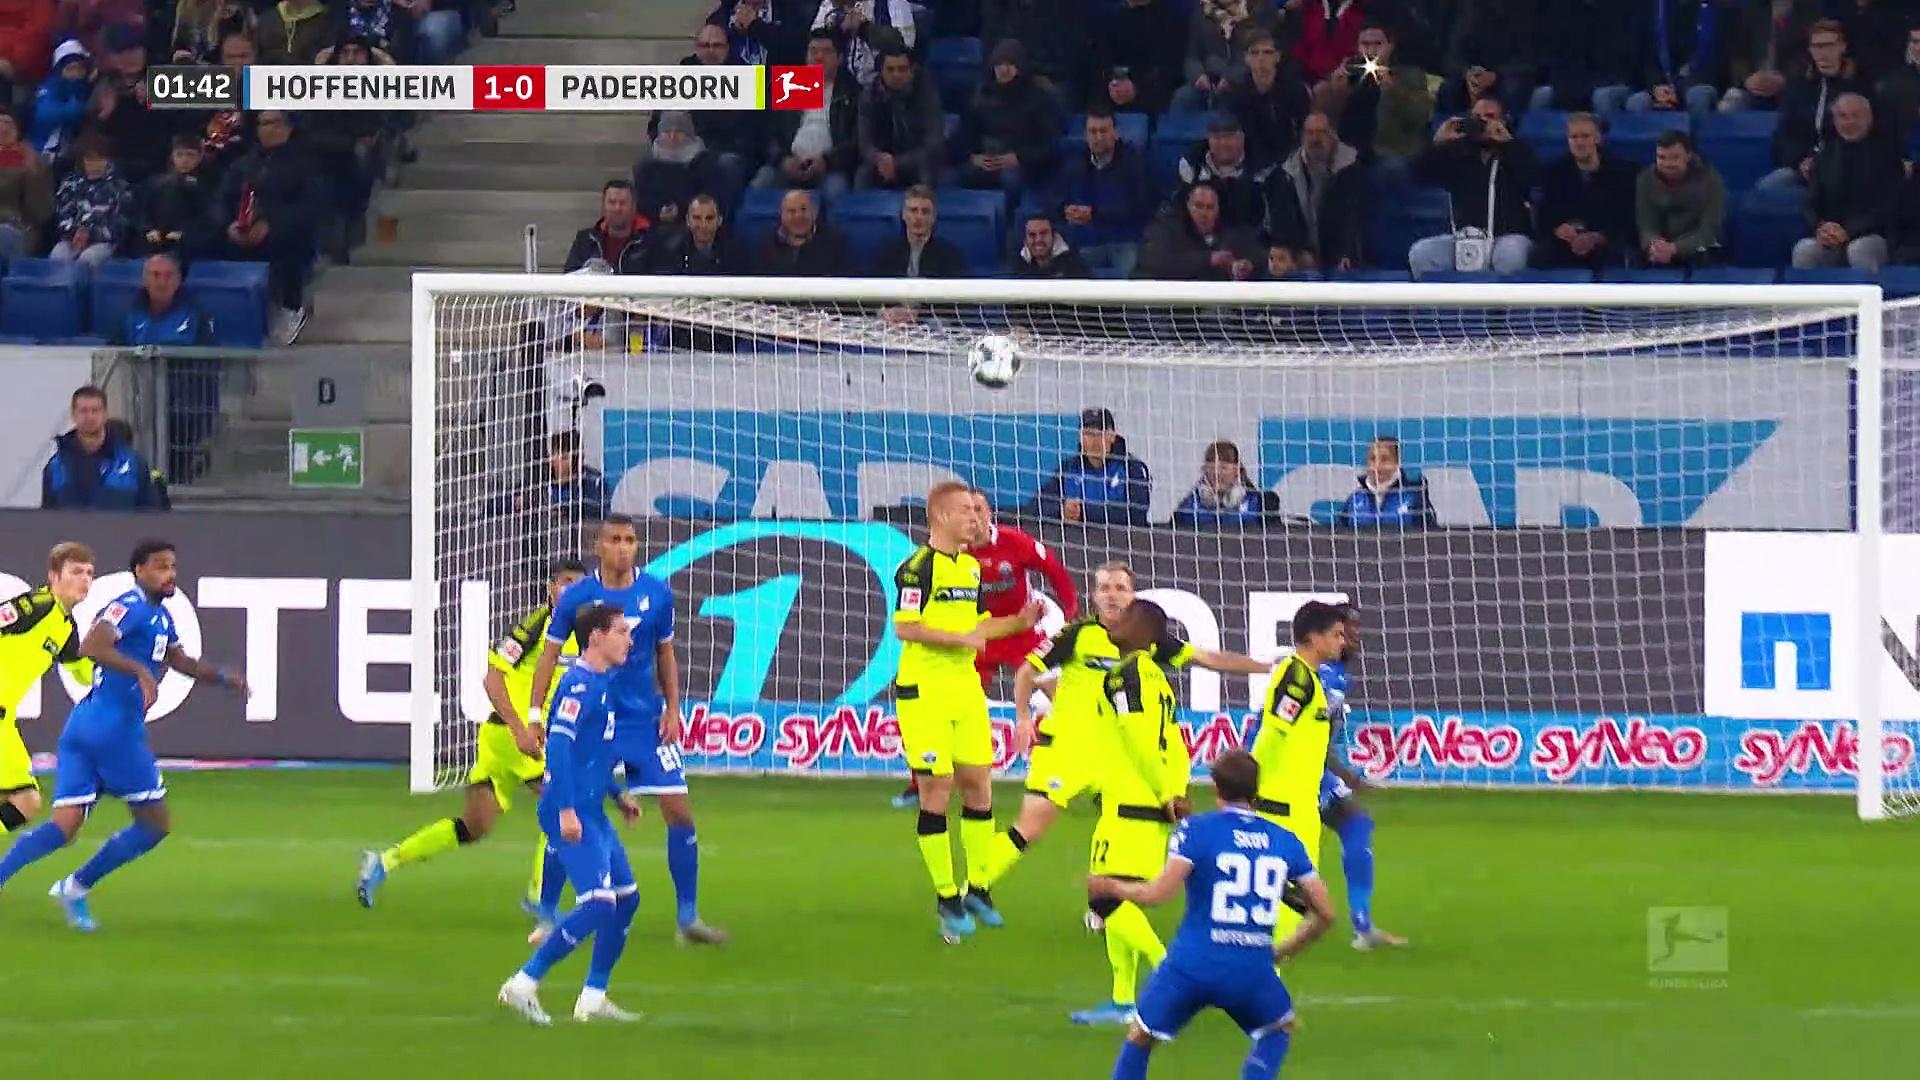 10. Hafta / Hoffenheim - Paderborn: 3-0 (Özet)